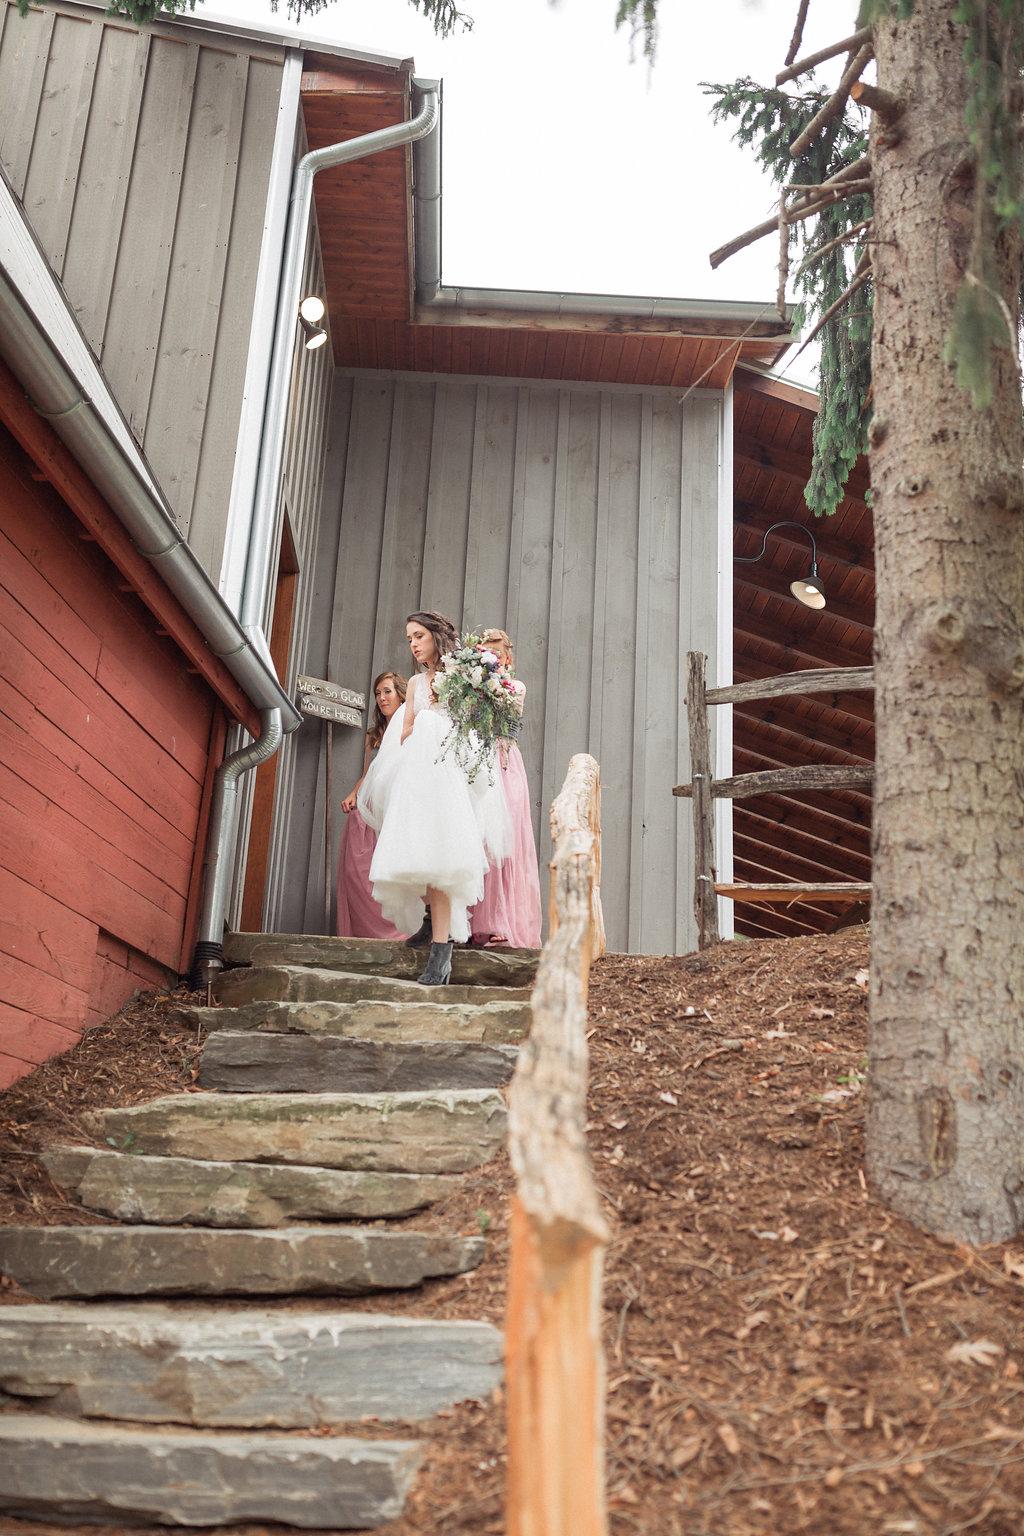 Honeysuckle-Hill-Weddings-Mallory-Patrick-39.jpg